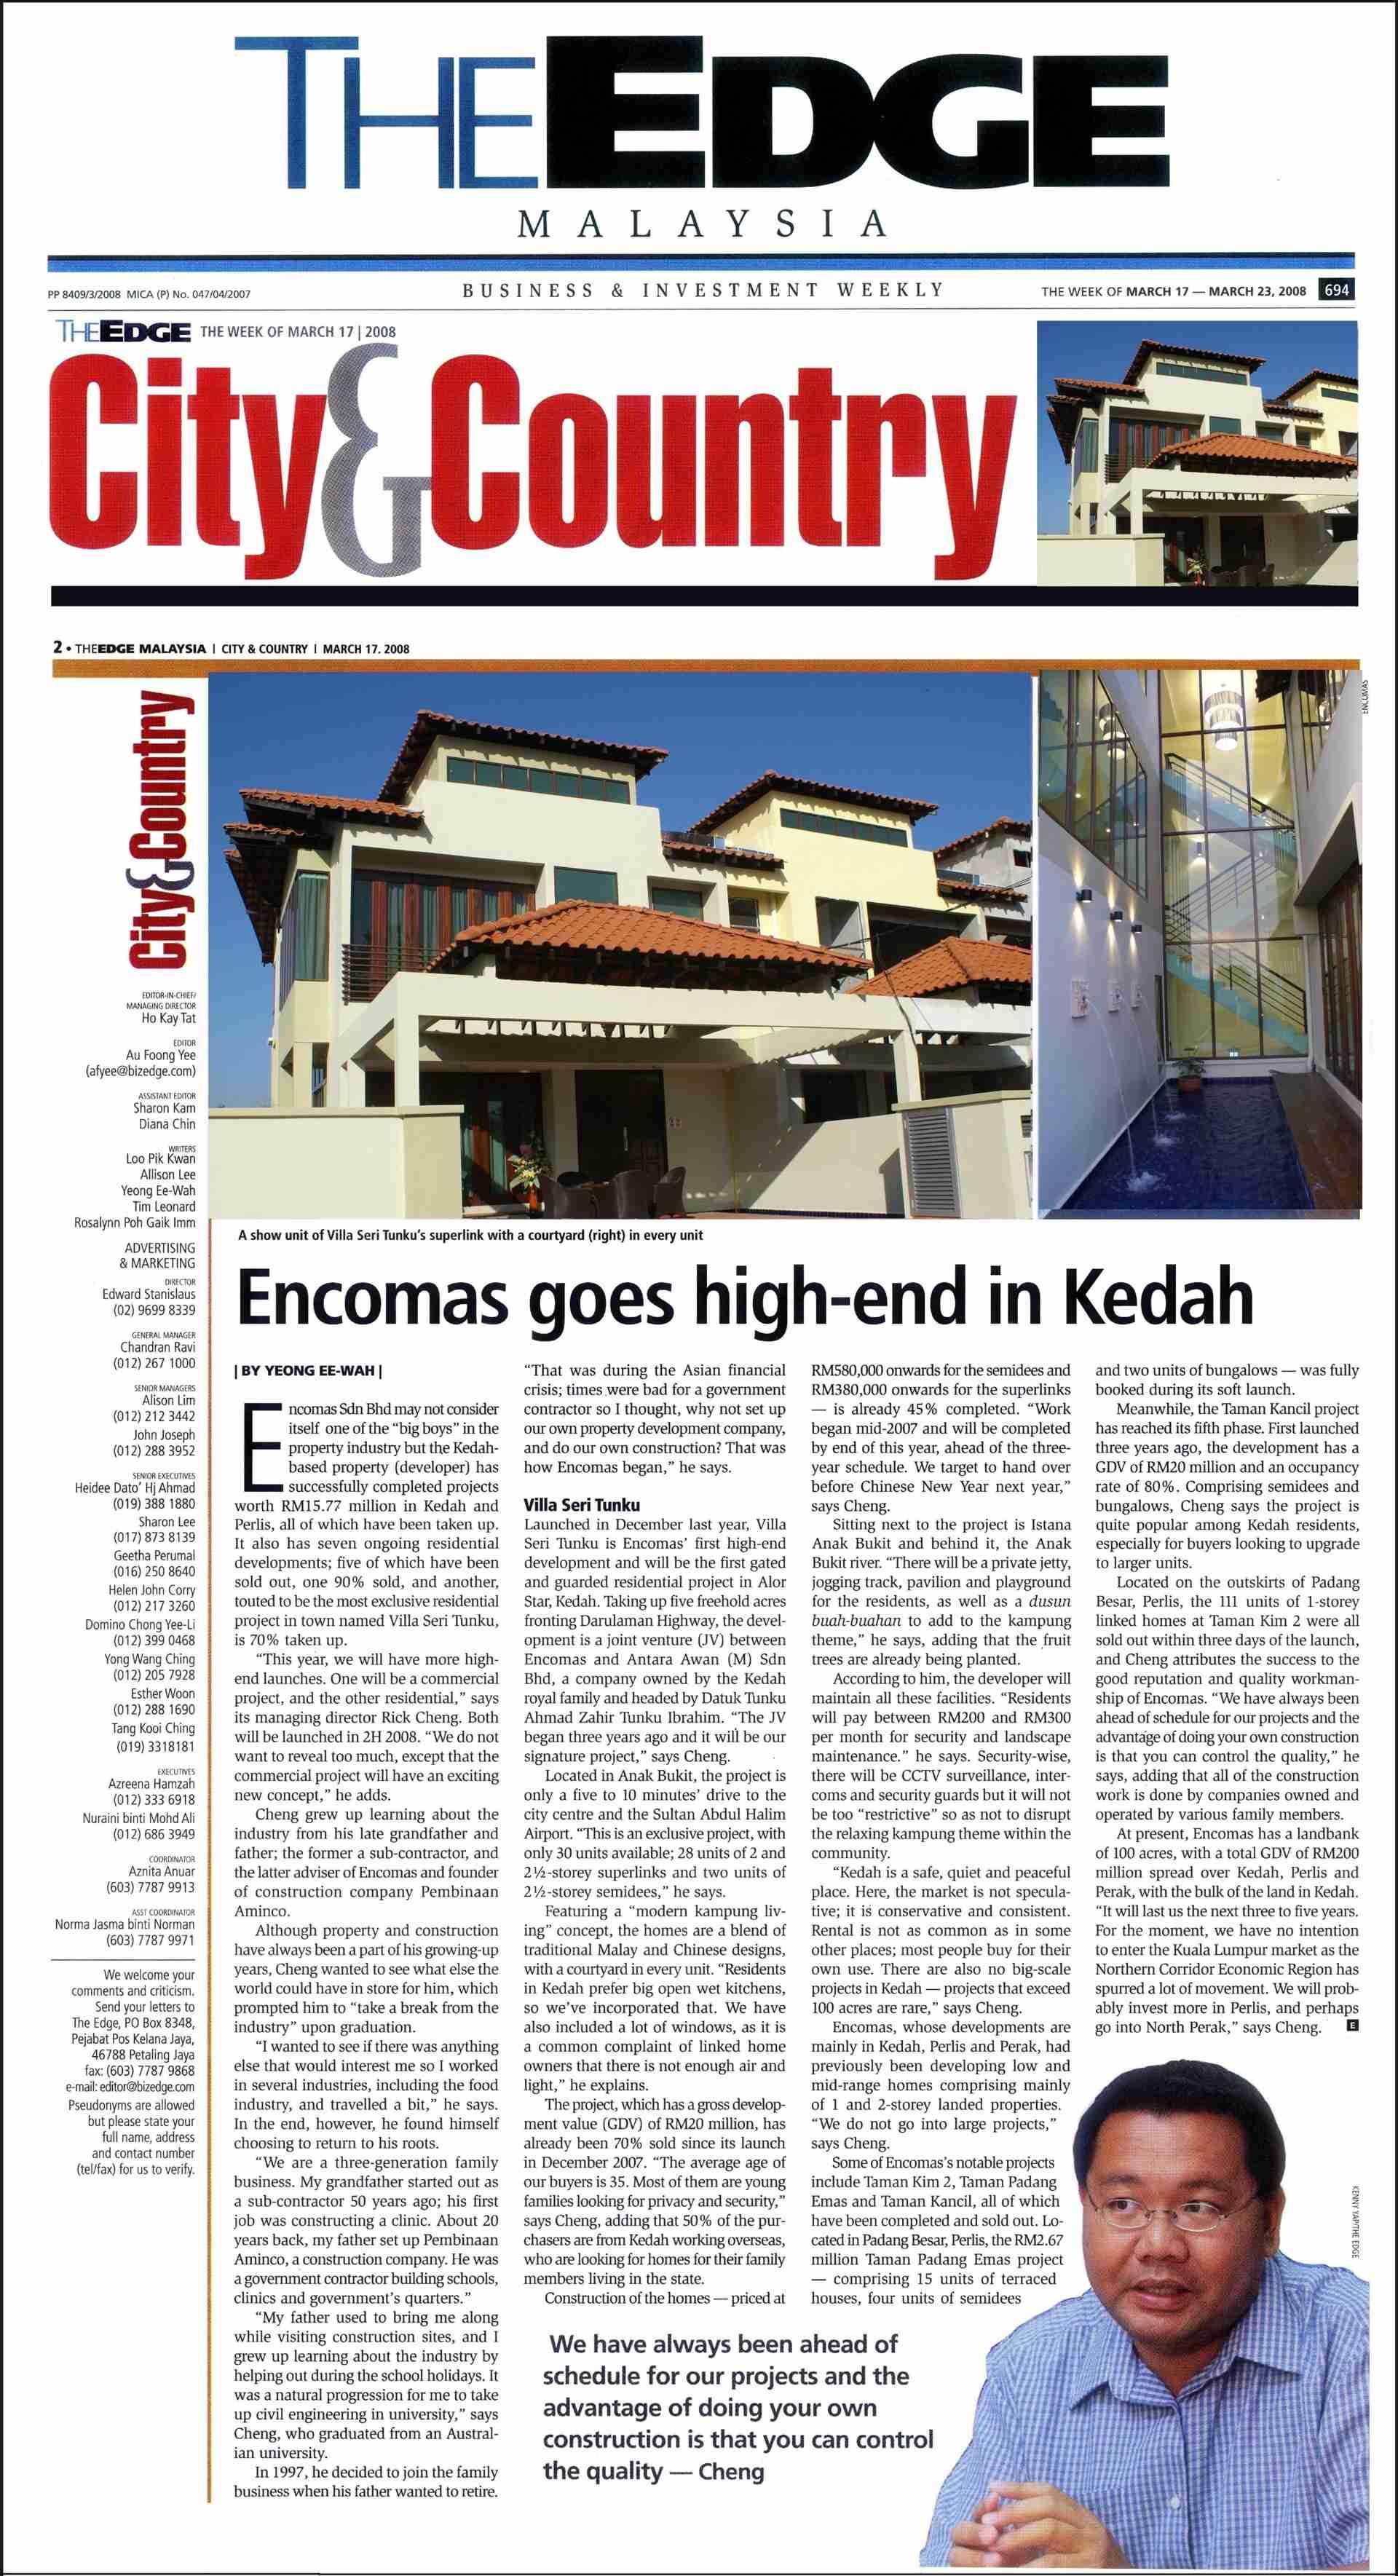 2008_03_17 The Edge - Encomas goes high-end in Kedah